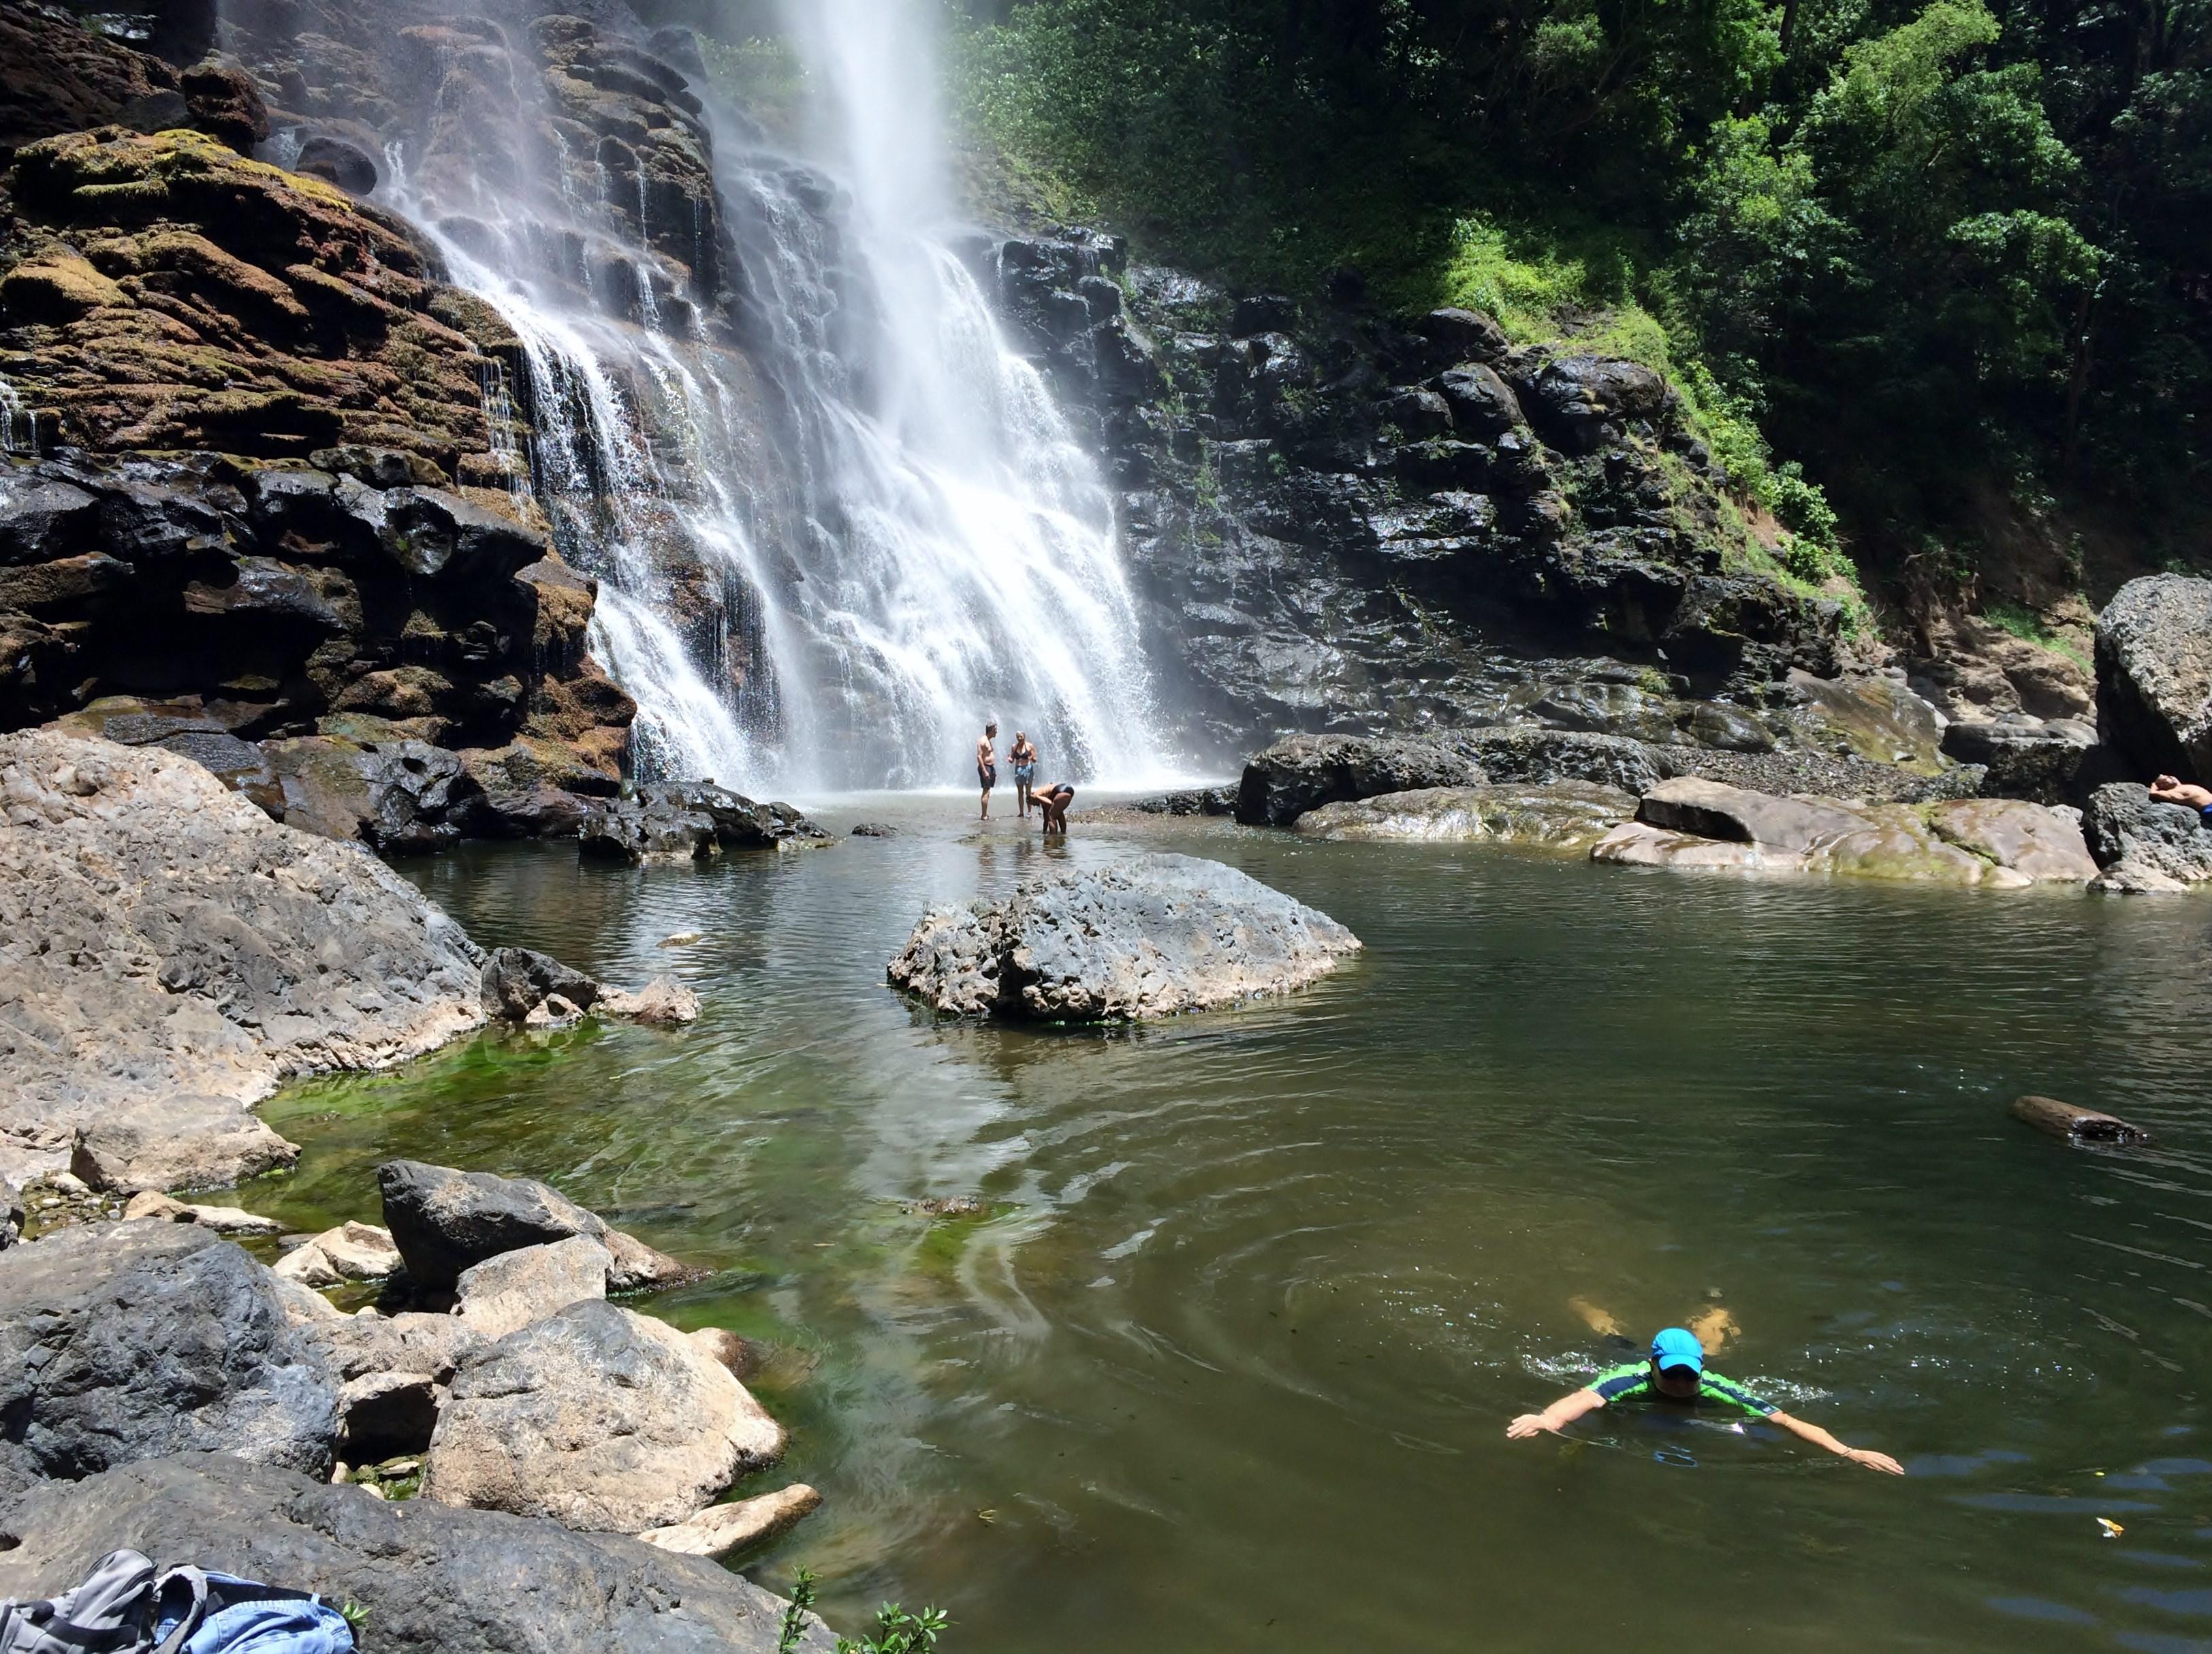 KiKi-Falls-swimming The Waterfalls Just Keep Getting Better . . . Hiking in Panama Panama The Great Outdoors